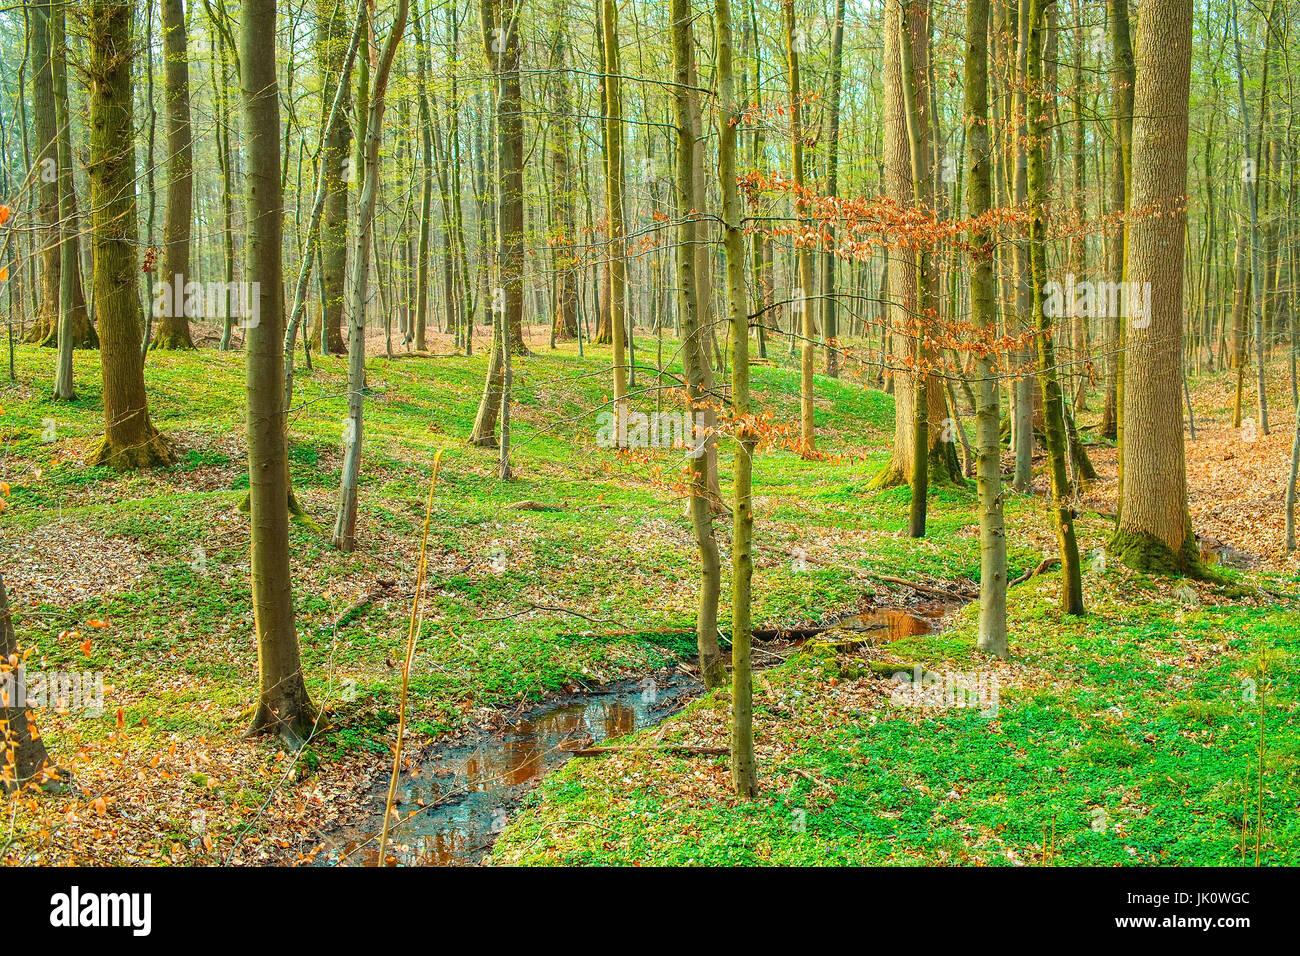 more unterfreely of growth beech-dominated mixed forest with small watercourse before light-robbing blattaustrieb, unterwuchsfreier buchendominierter  Stock Photo